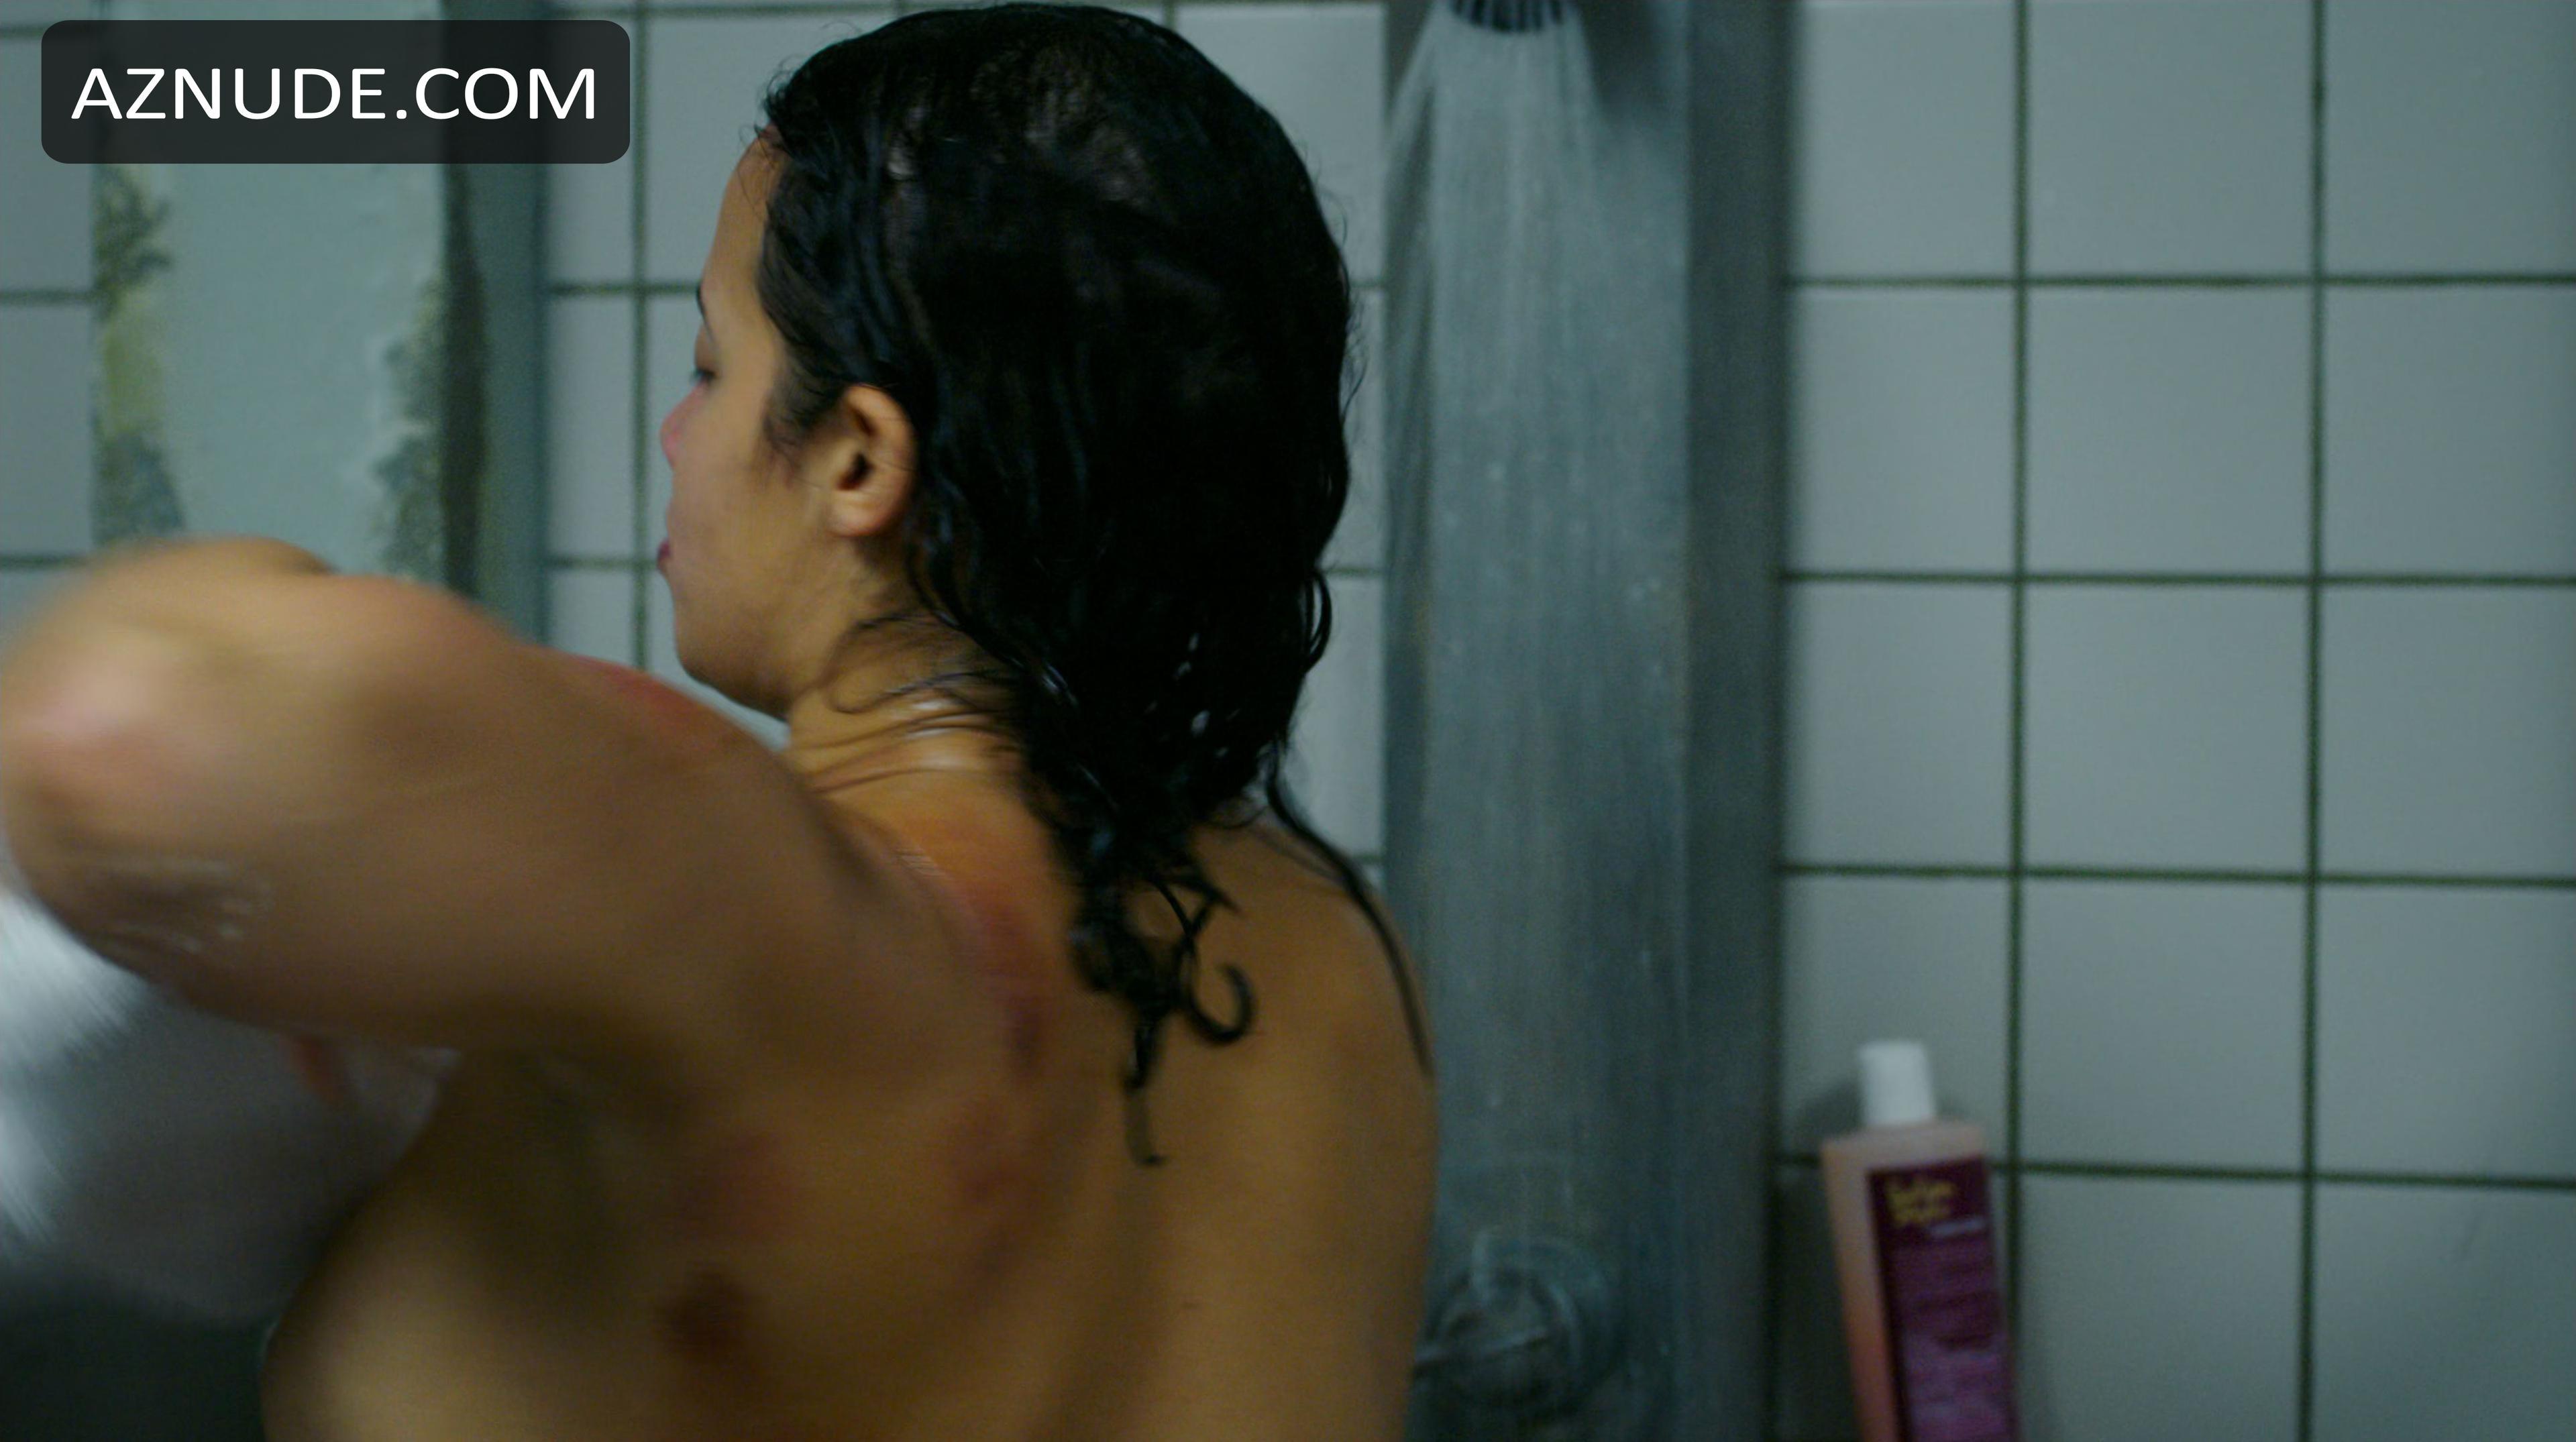 Hots Dascha Polanco Nude Pics